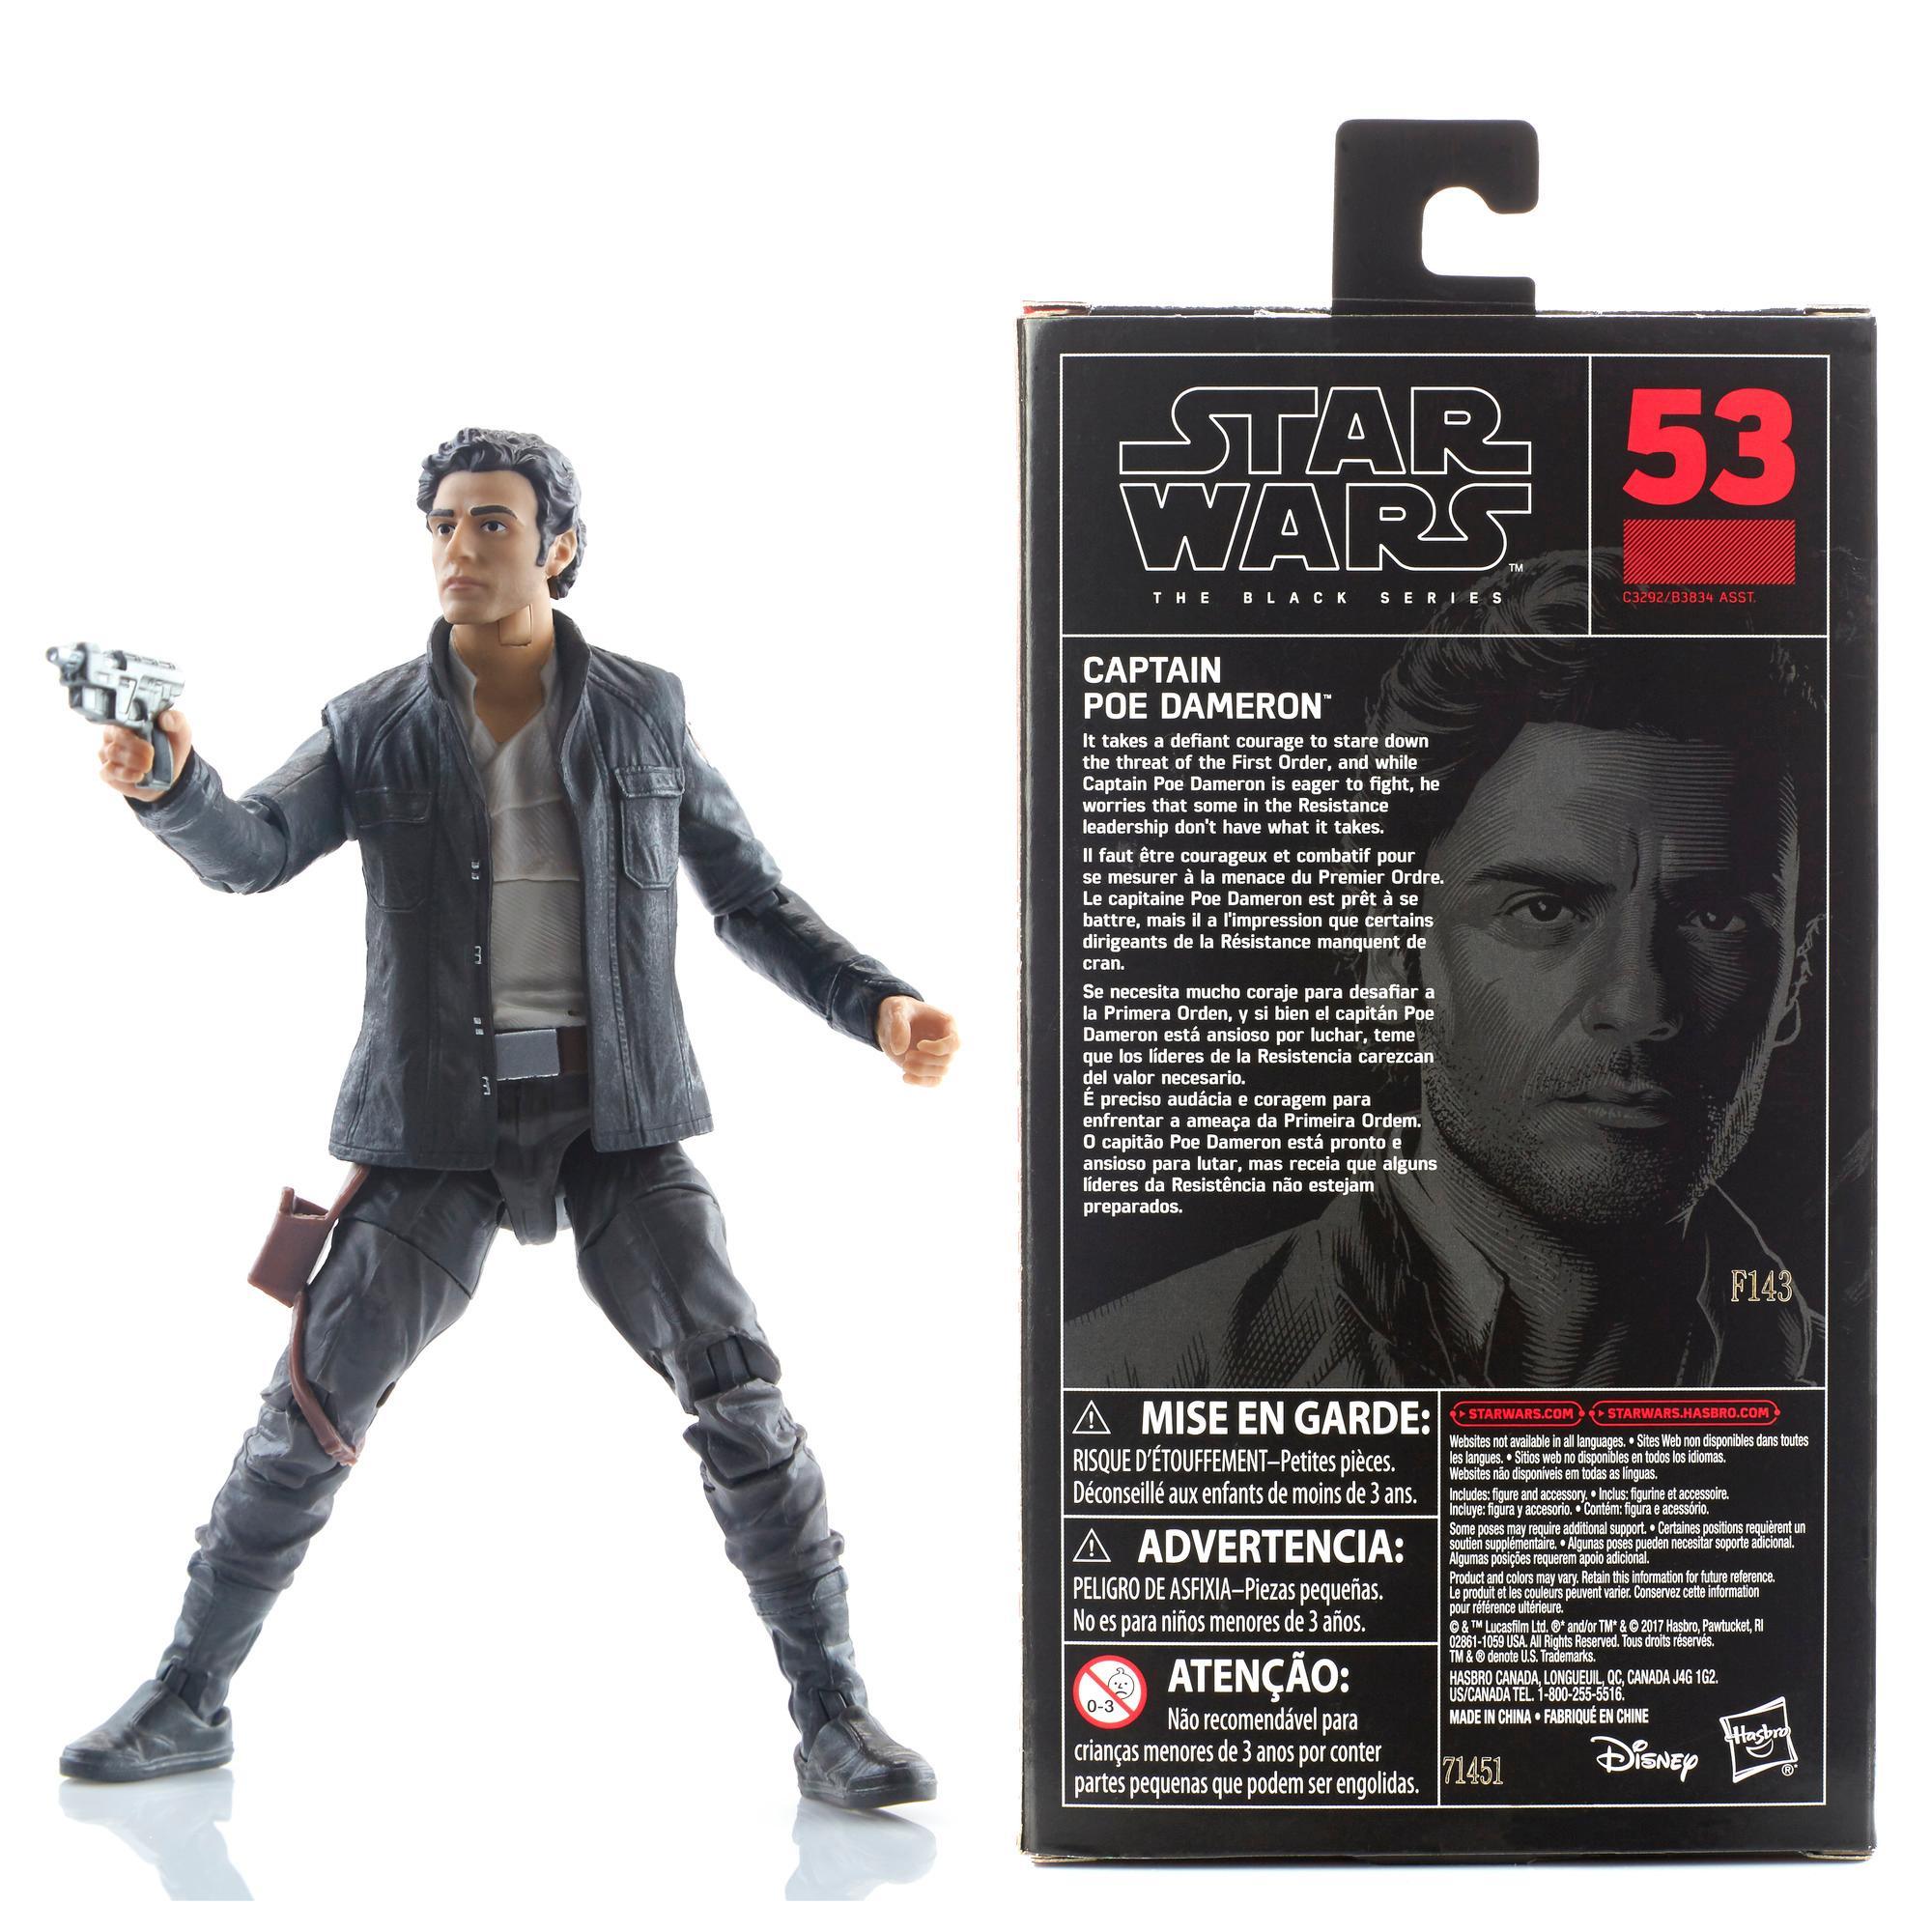 Star Wars The Black Series Captain Poe Dameron